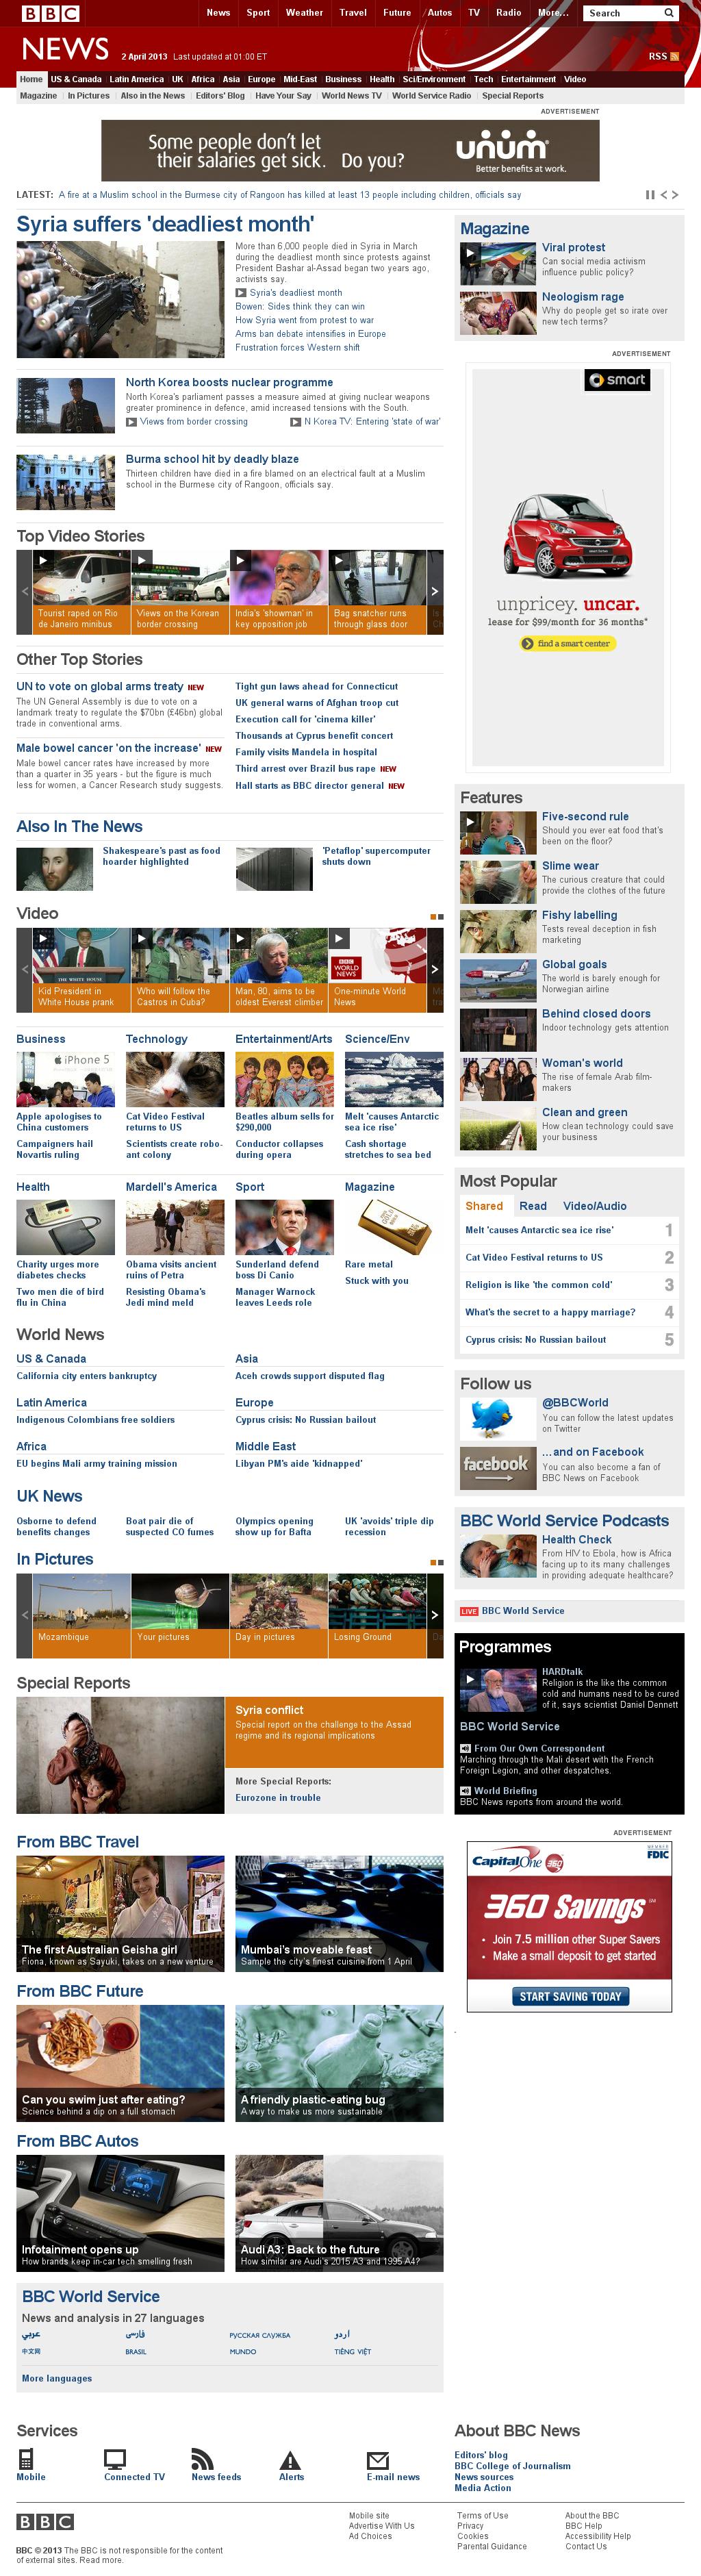 BBC at Tuesday April 2, 2013, 4:01 a.m. UTC